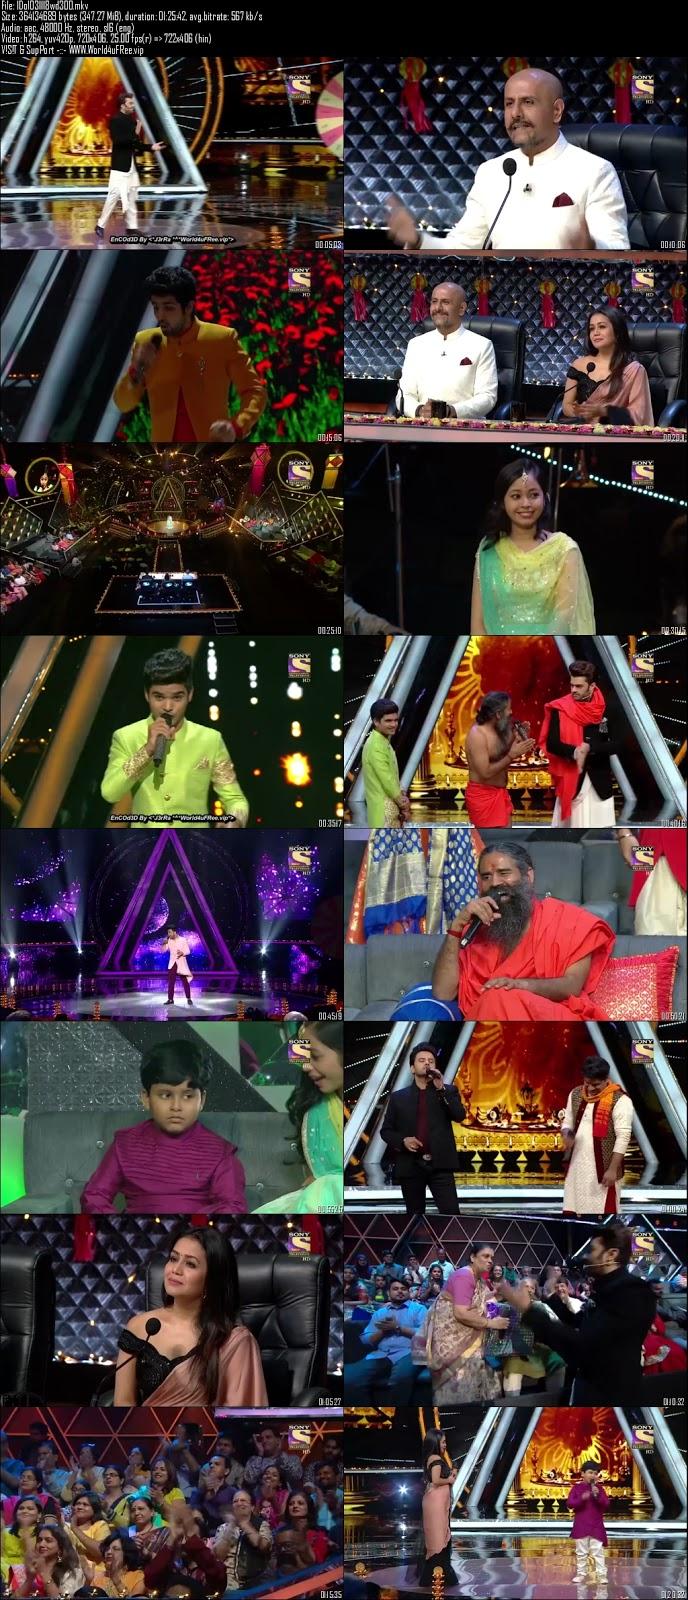 Indian Idol Season 10 03 November 2018 HDTV 480p 300Mb world4ufree.vip tv show Indian Idol Season 10 hindi tv show Indian Idol Season 10 Sony Set tv show compressed small size free download or watch online at world4ufree.vip